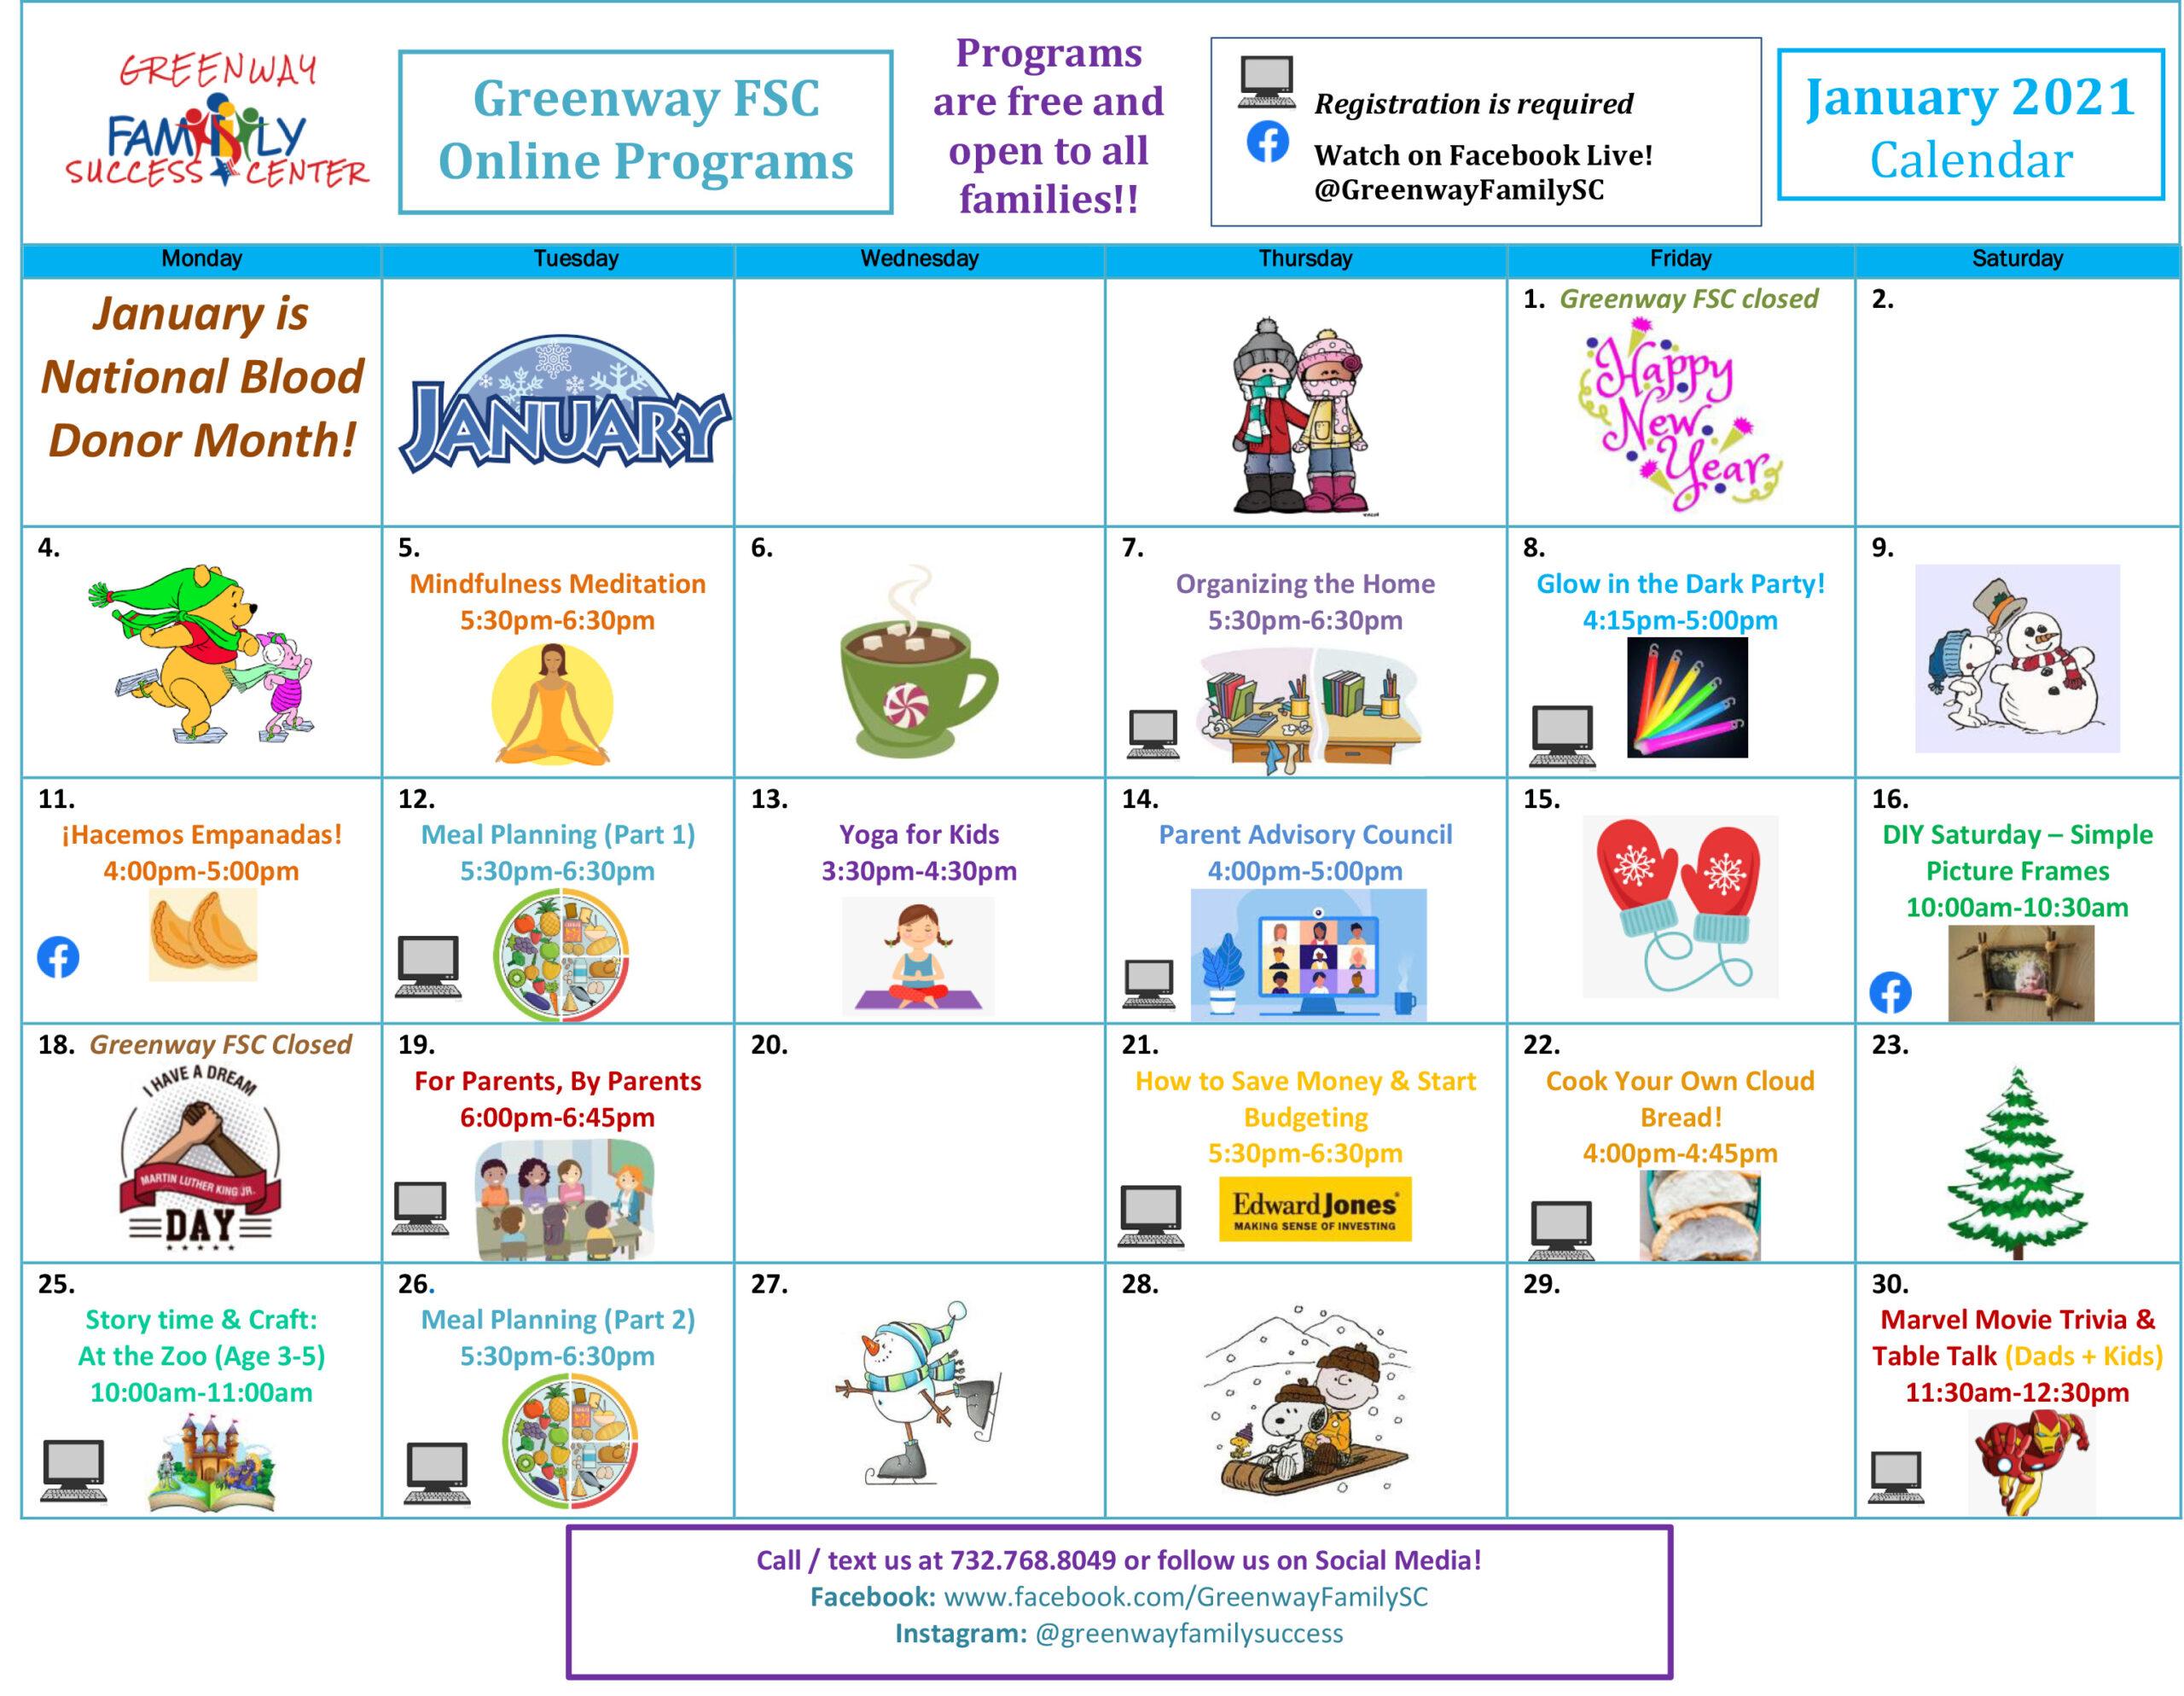 Greenway Family Success Center Camendar January 2021